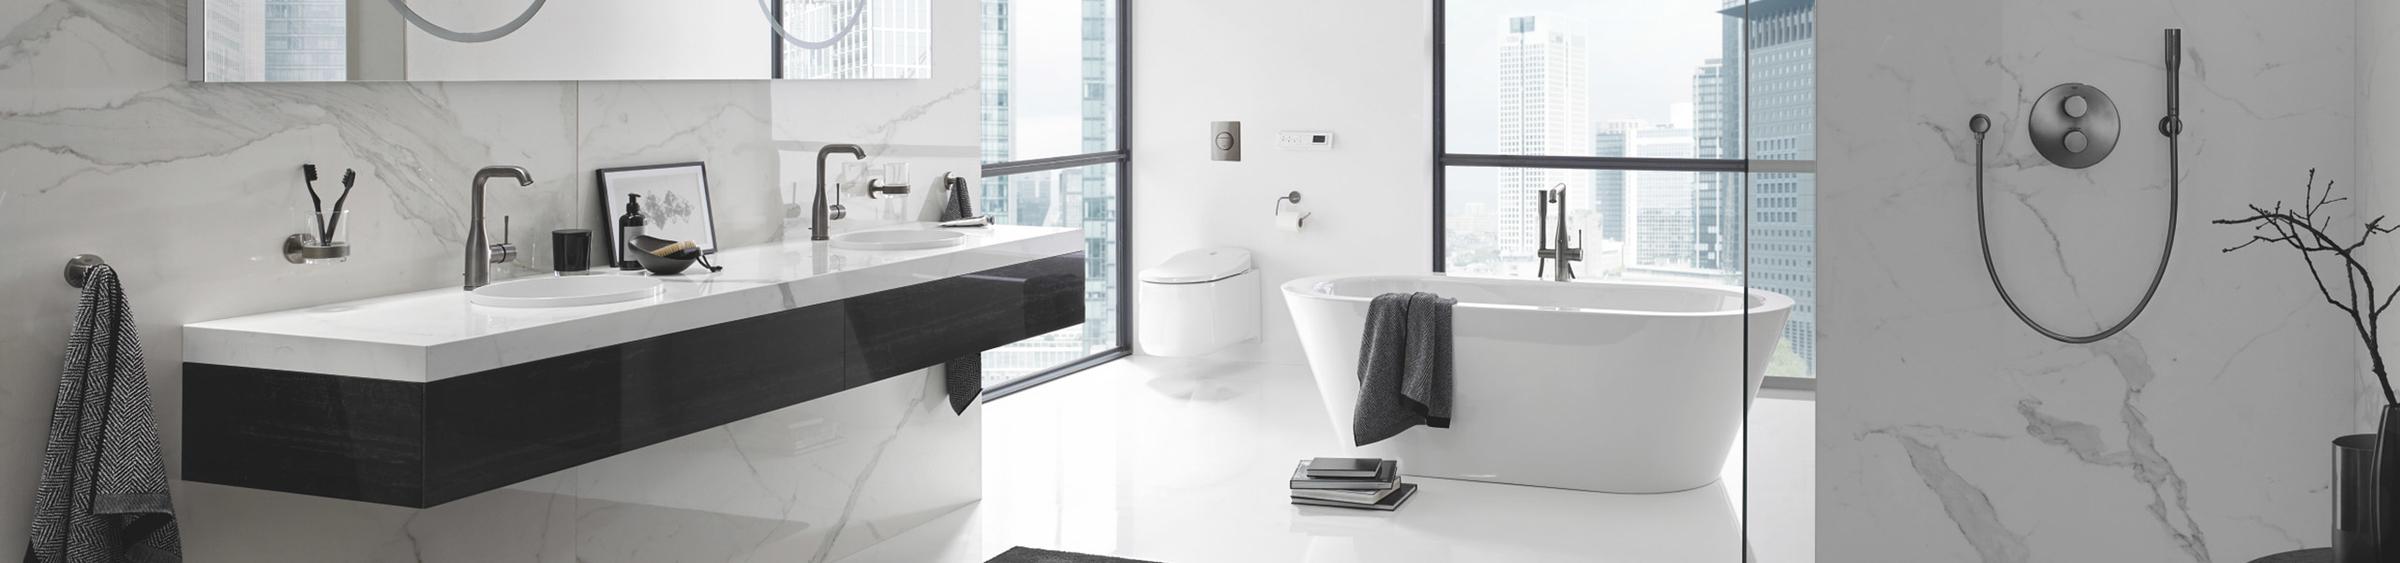 Grote badkamer indelen - Grote badkamer indelen